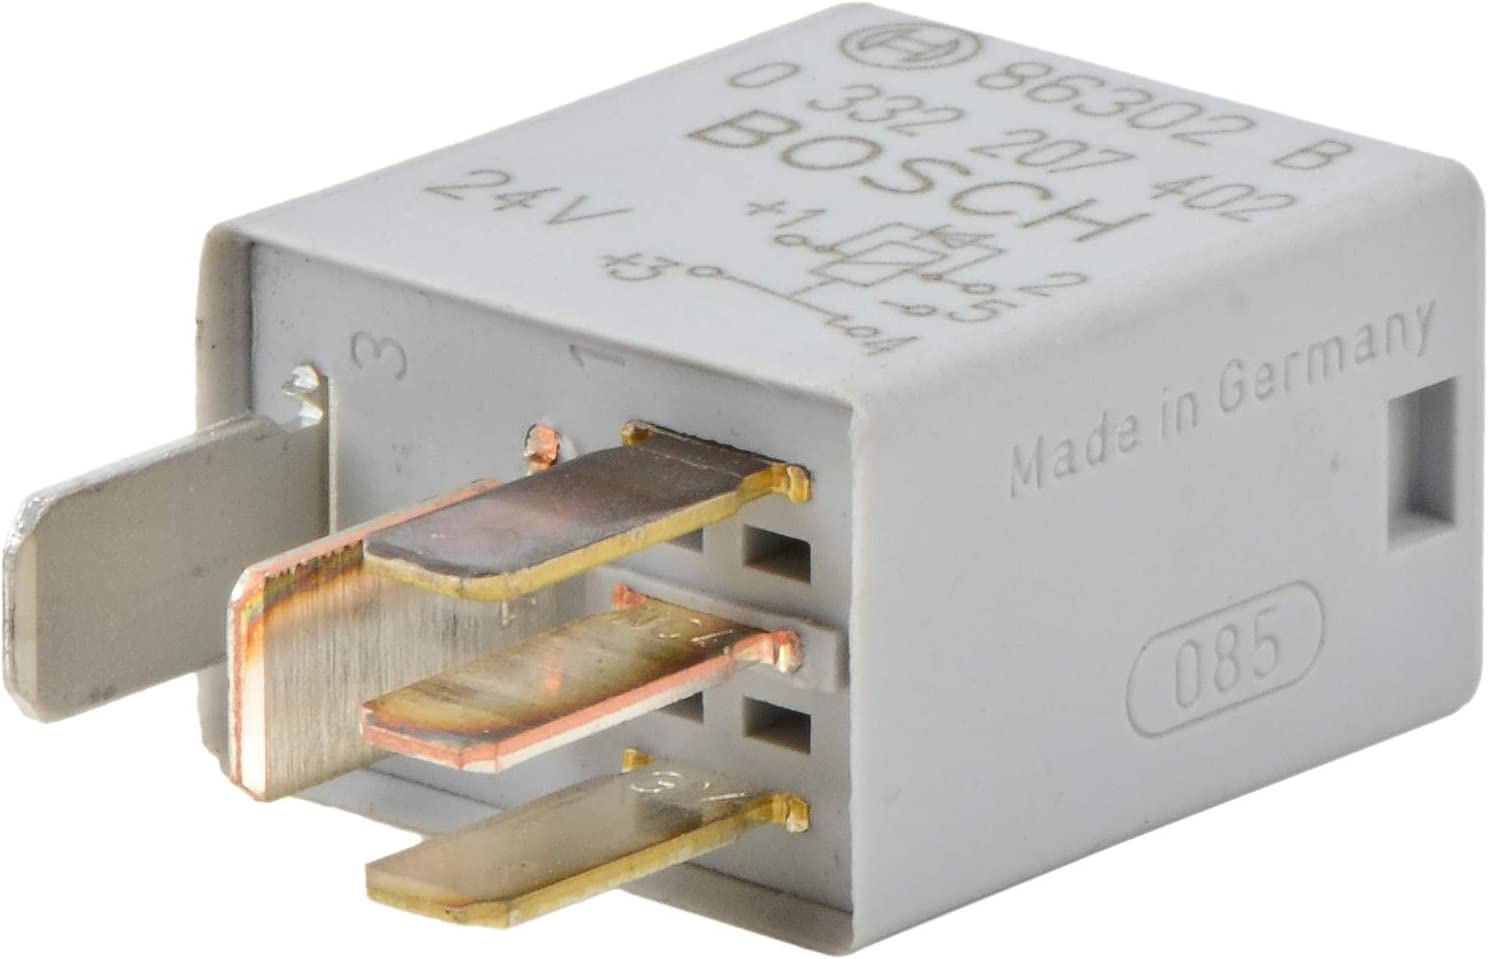 Bosch 0332207402 Micro Relais 24v 10a Ip5k4 Betriebstemperatur Von 40 Bis 100 Wechselrelais 5 Pin Relais Mit Diode Auto